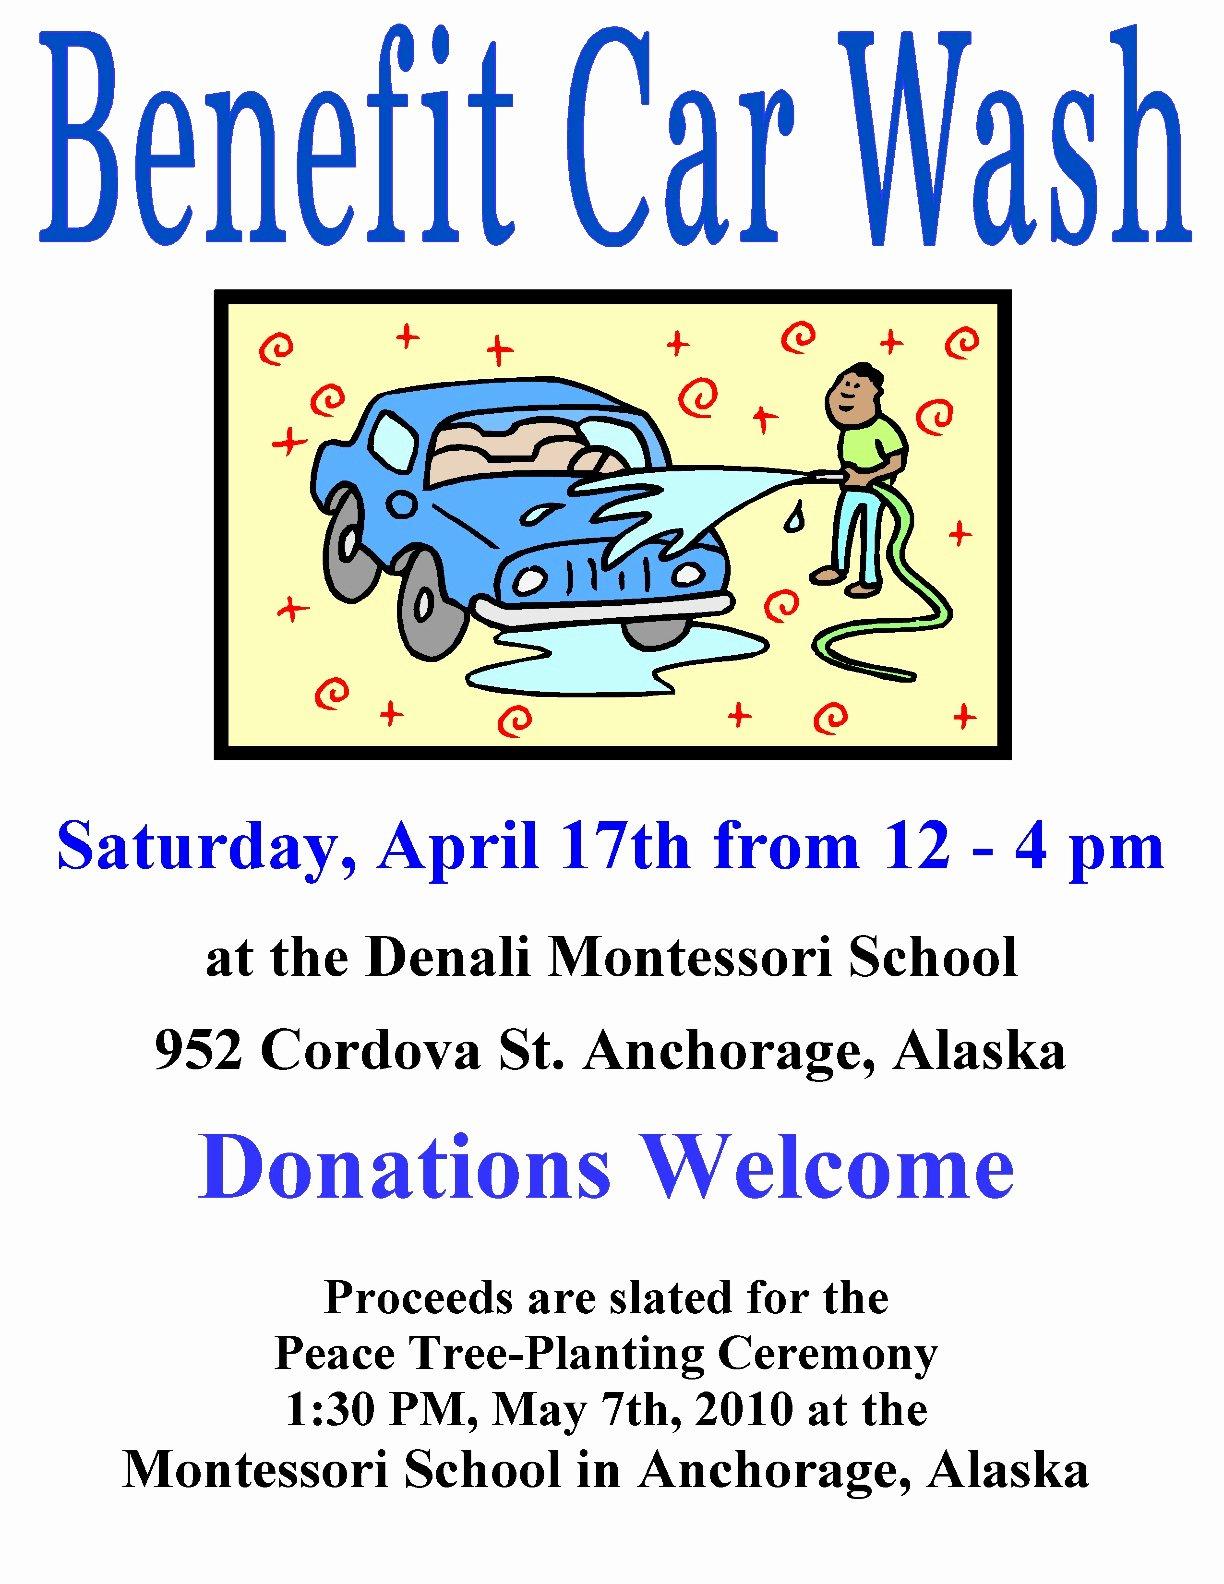 Car Wash Fundraiser Template Elegant 18 Of Car Wash Fundraiser Template Pintres